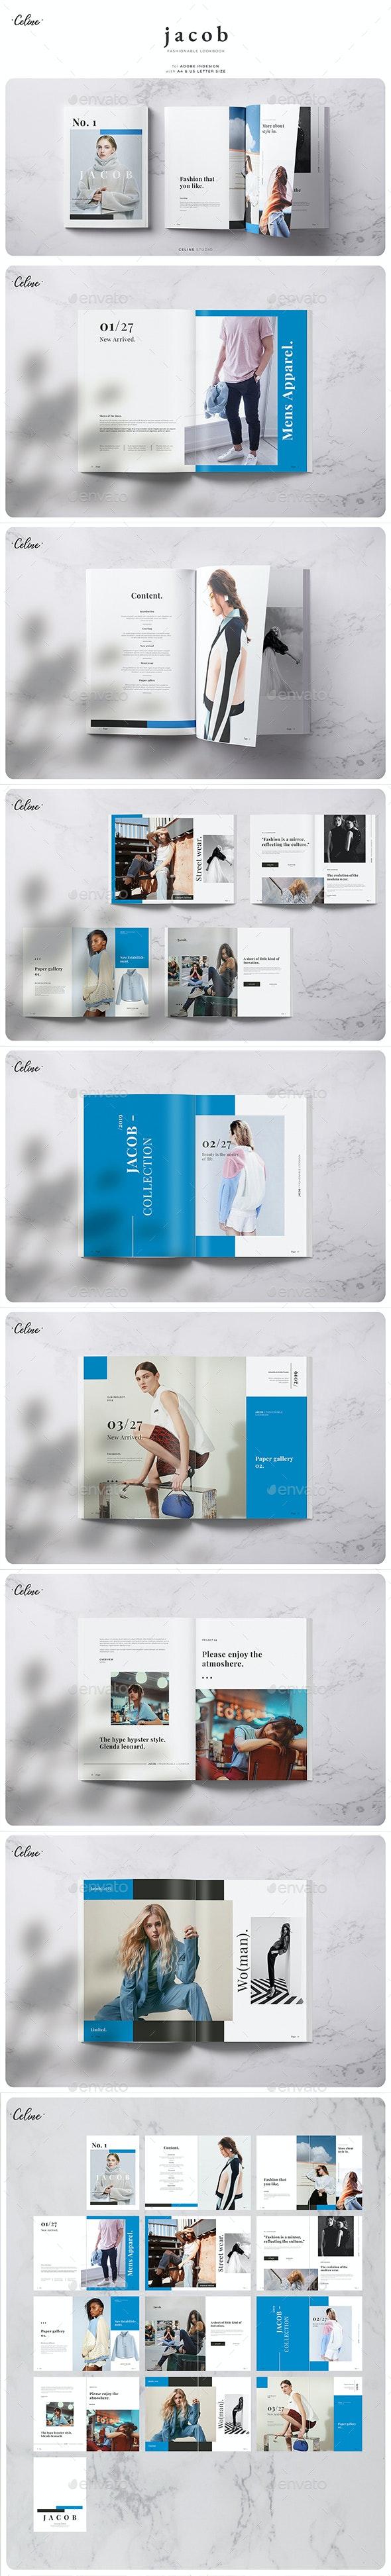 Jacob - Fashionable Lookbook - Magazines Print Templates